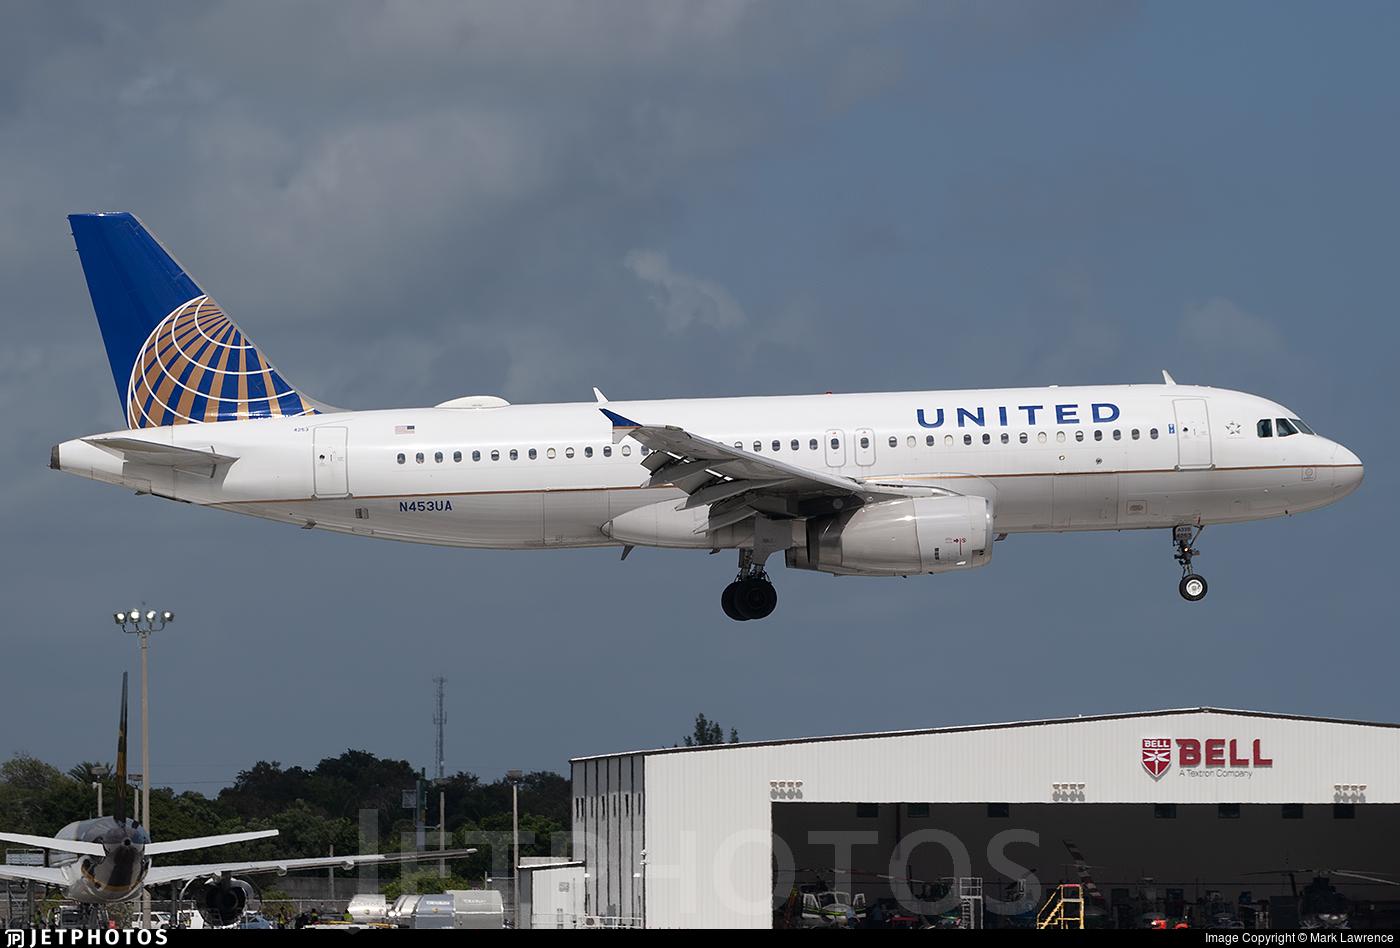 N453UA - Airbus A320-232 - United Airlines